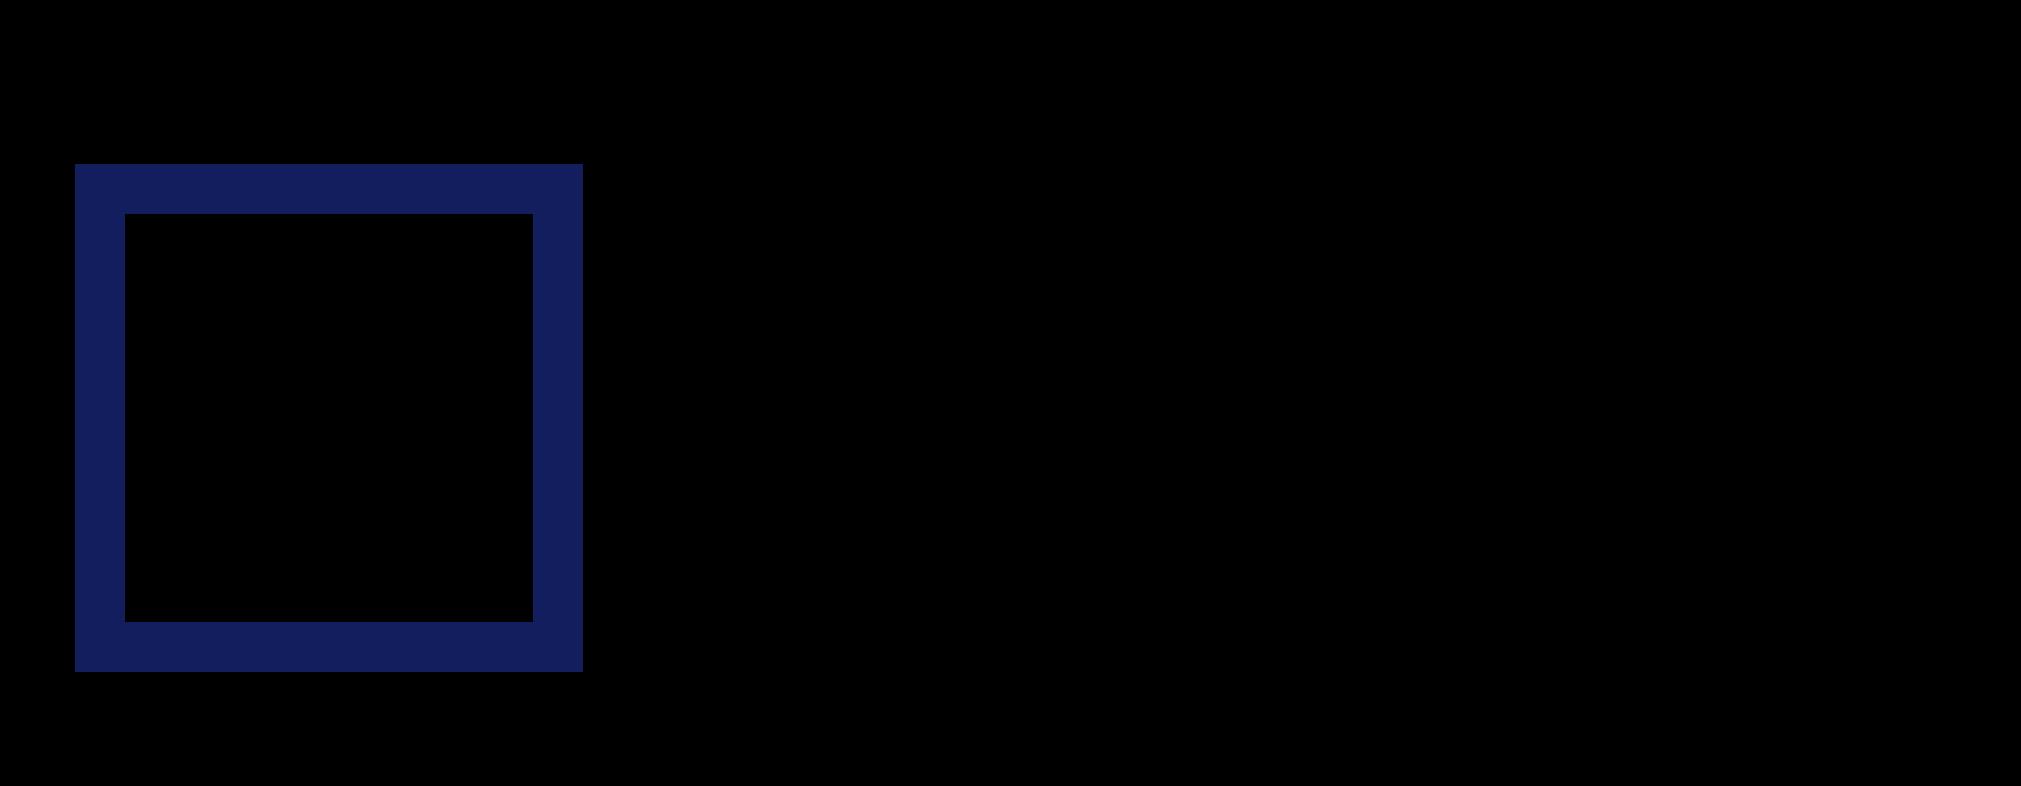 Benz Media Firmenlogo